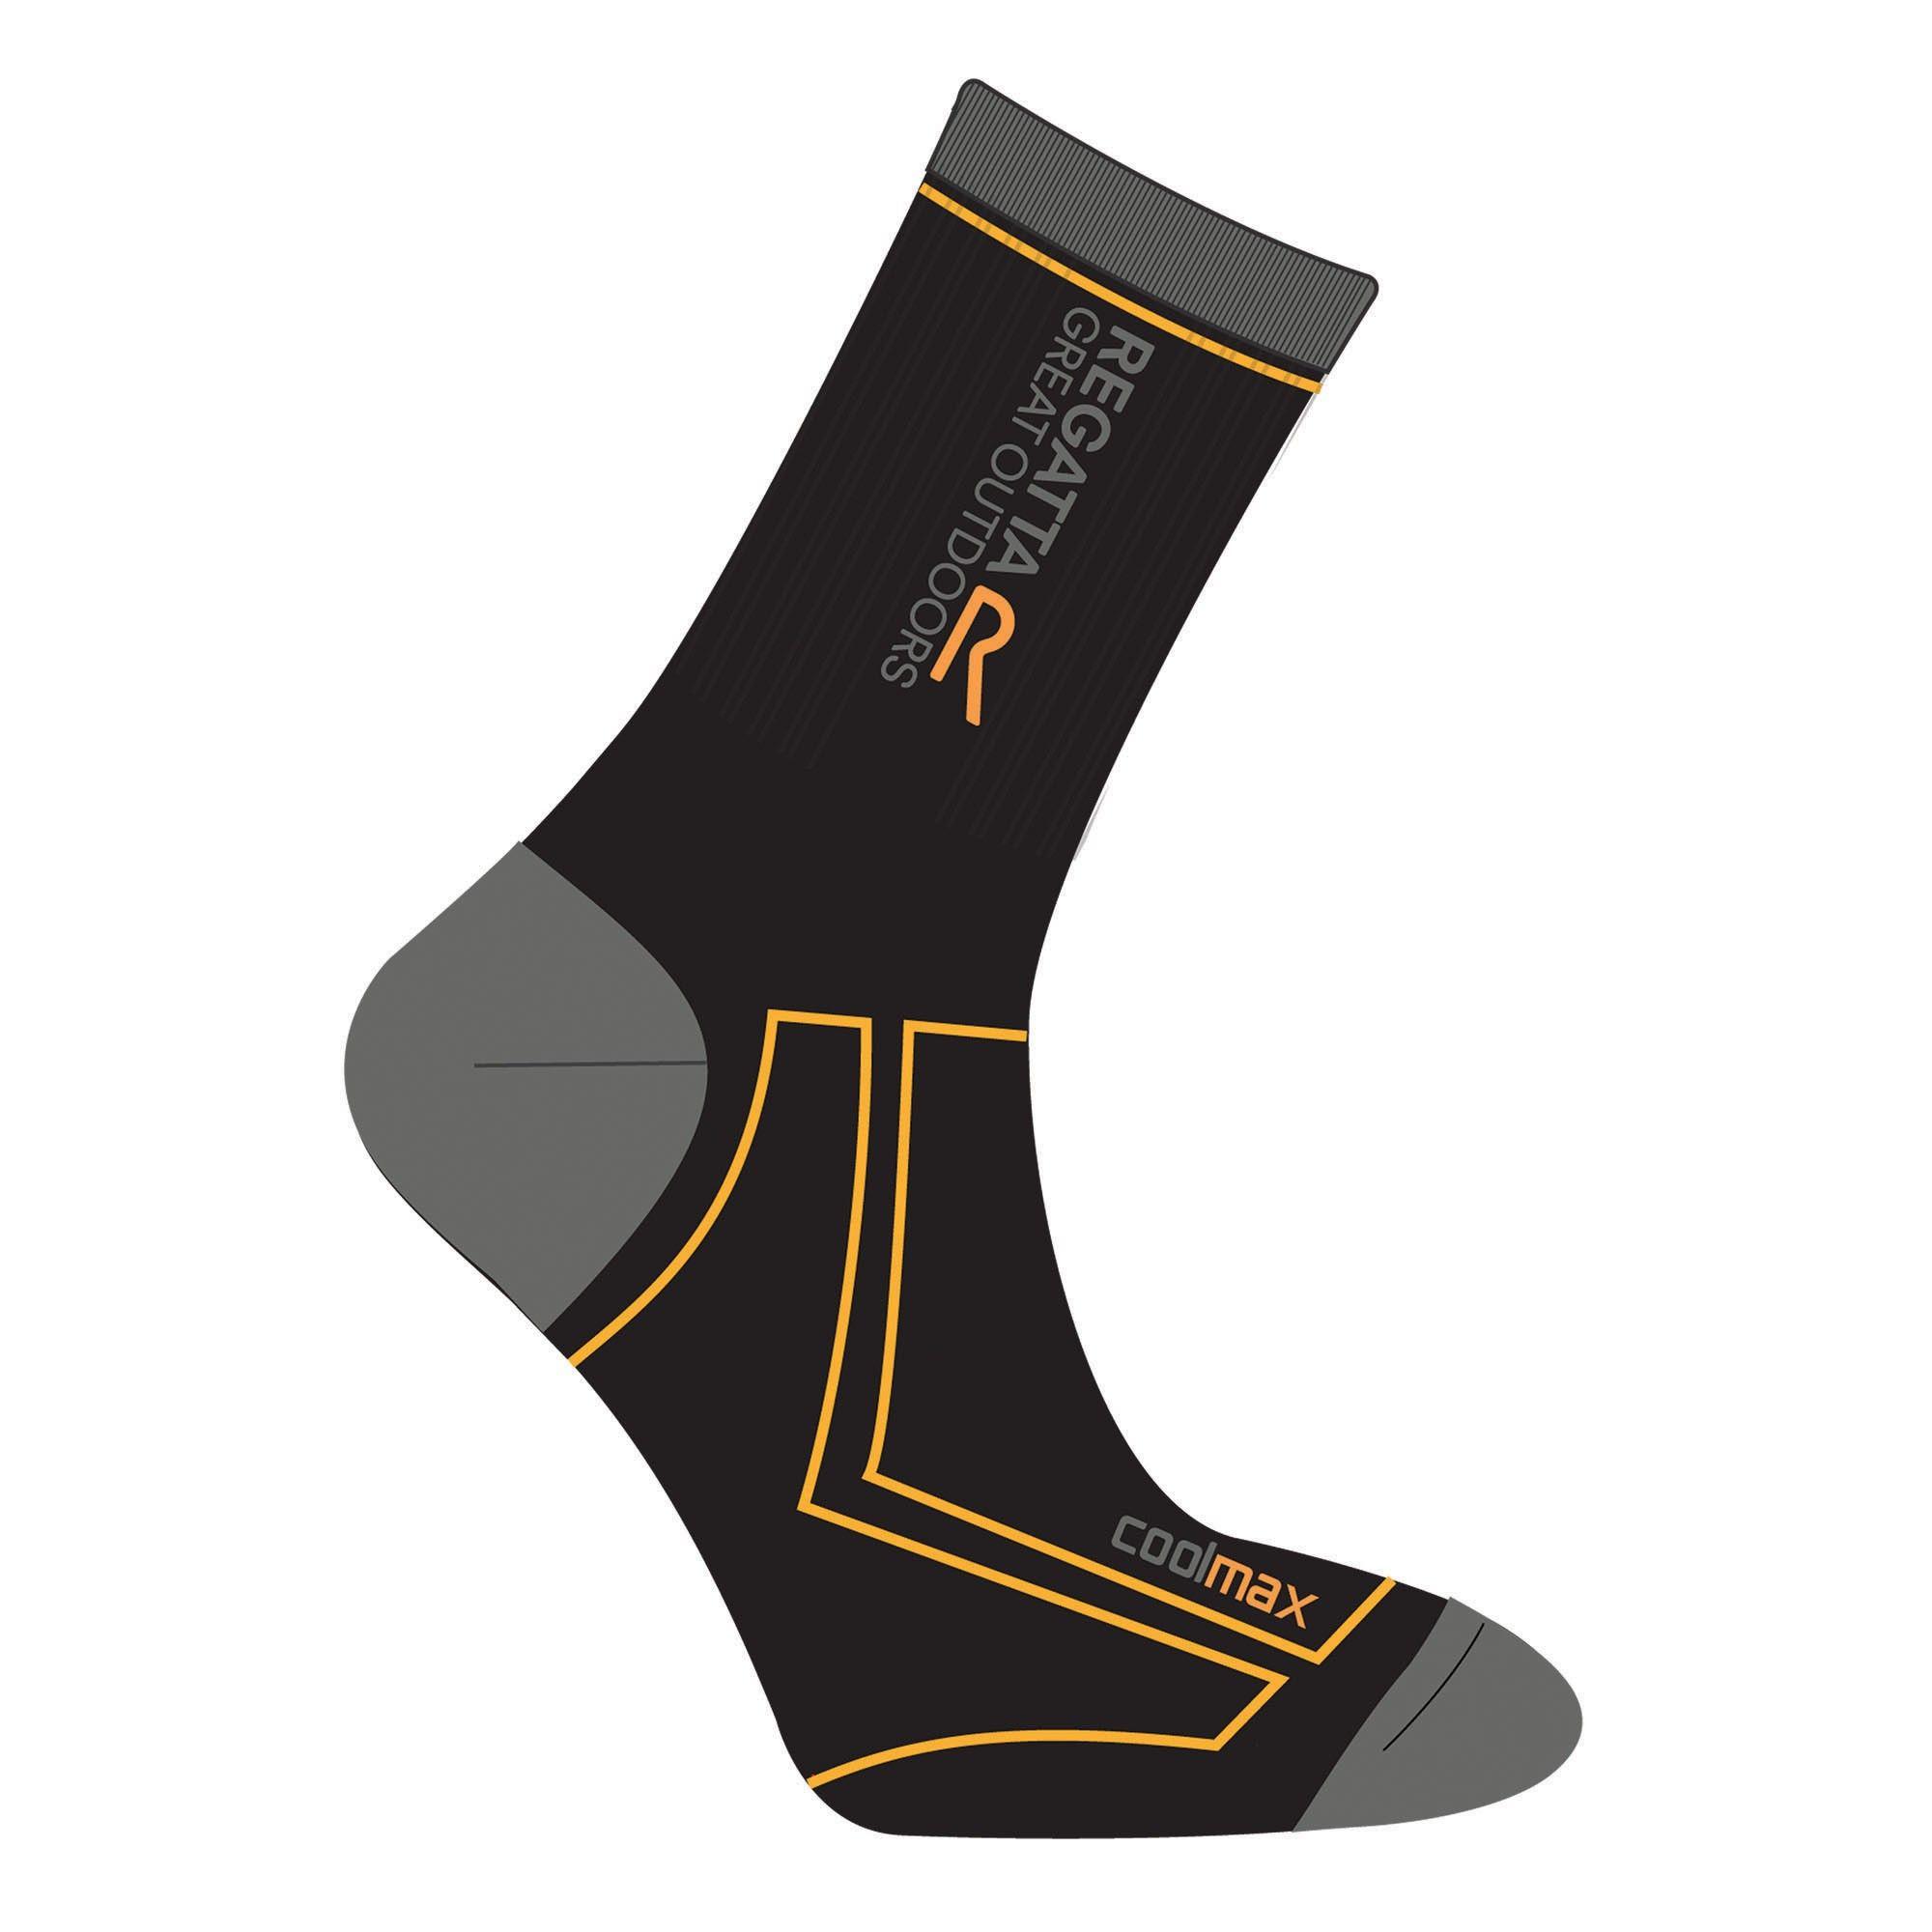 Regatta Great Outdoors Mens 2 Season Coolmax Trek & Trail Walking Socks